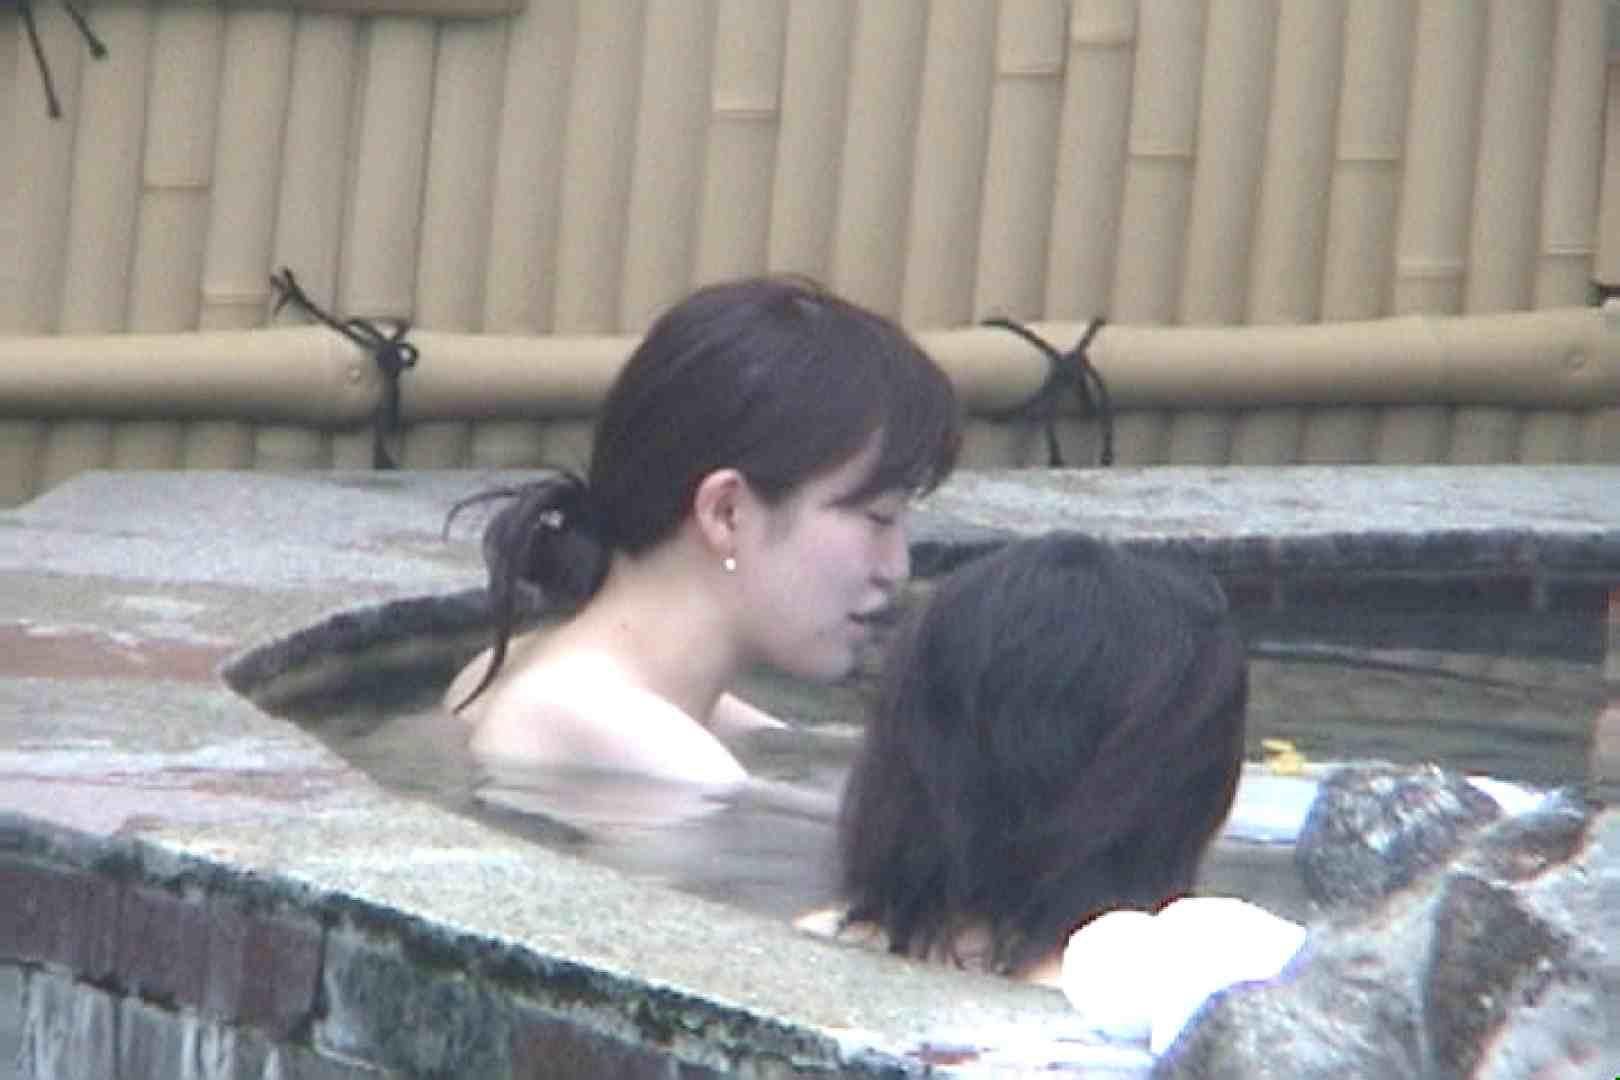 Aquaな露天風呂Vol.79【VIP限定】 盗撮 | HなOL  100pic 98